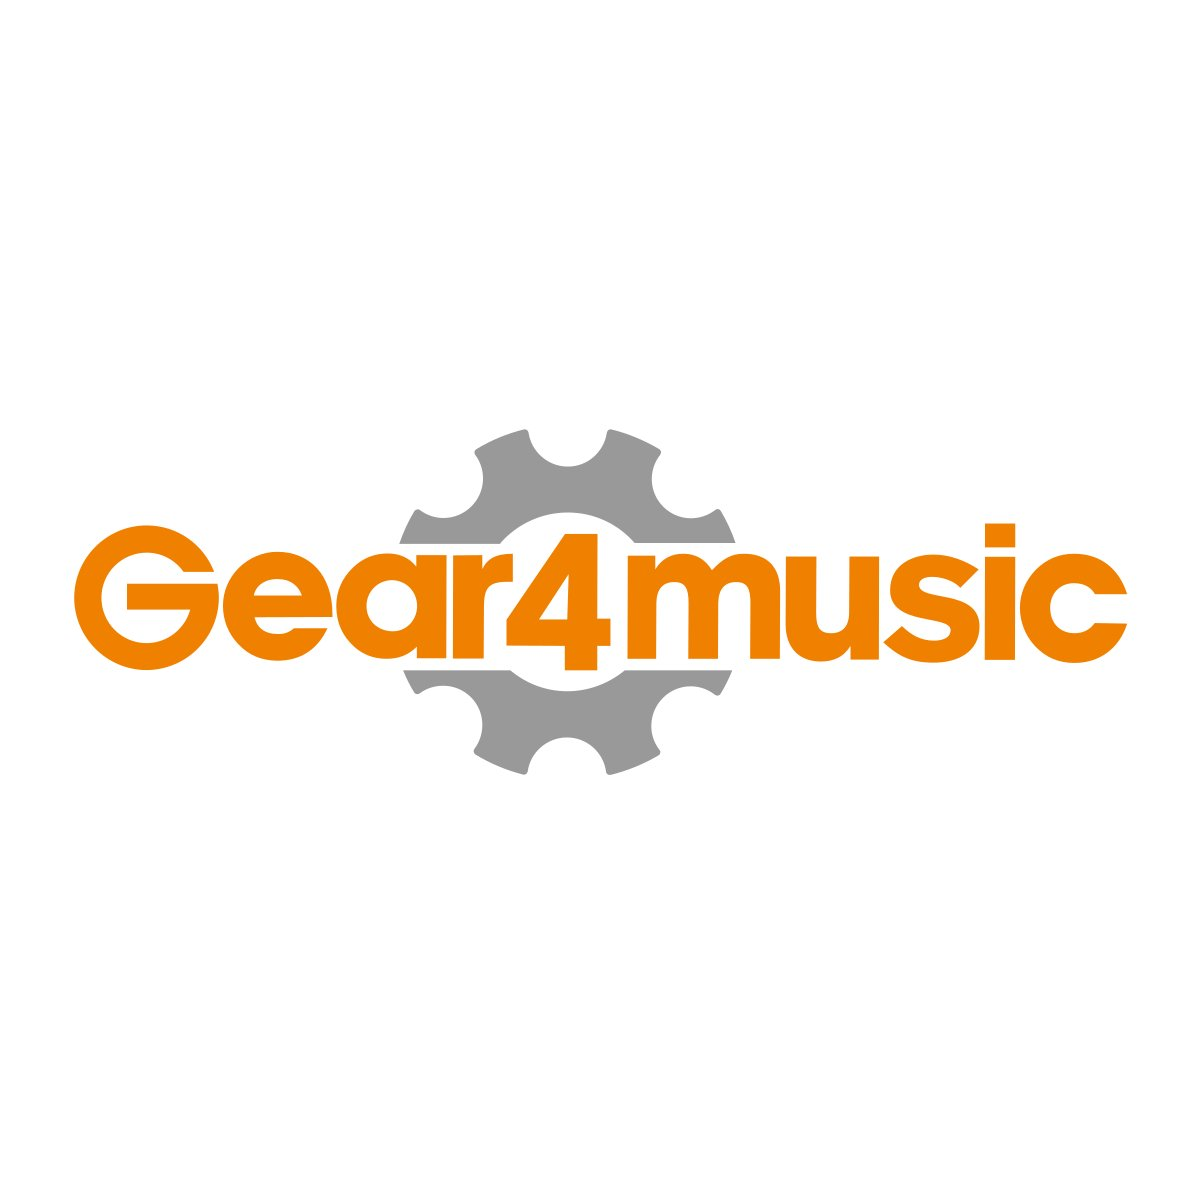 Gear4music   Shop Music Equipment & Musical Instruments